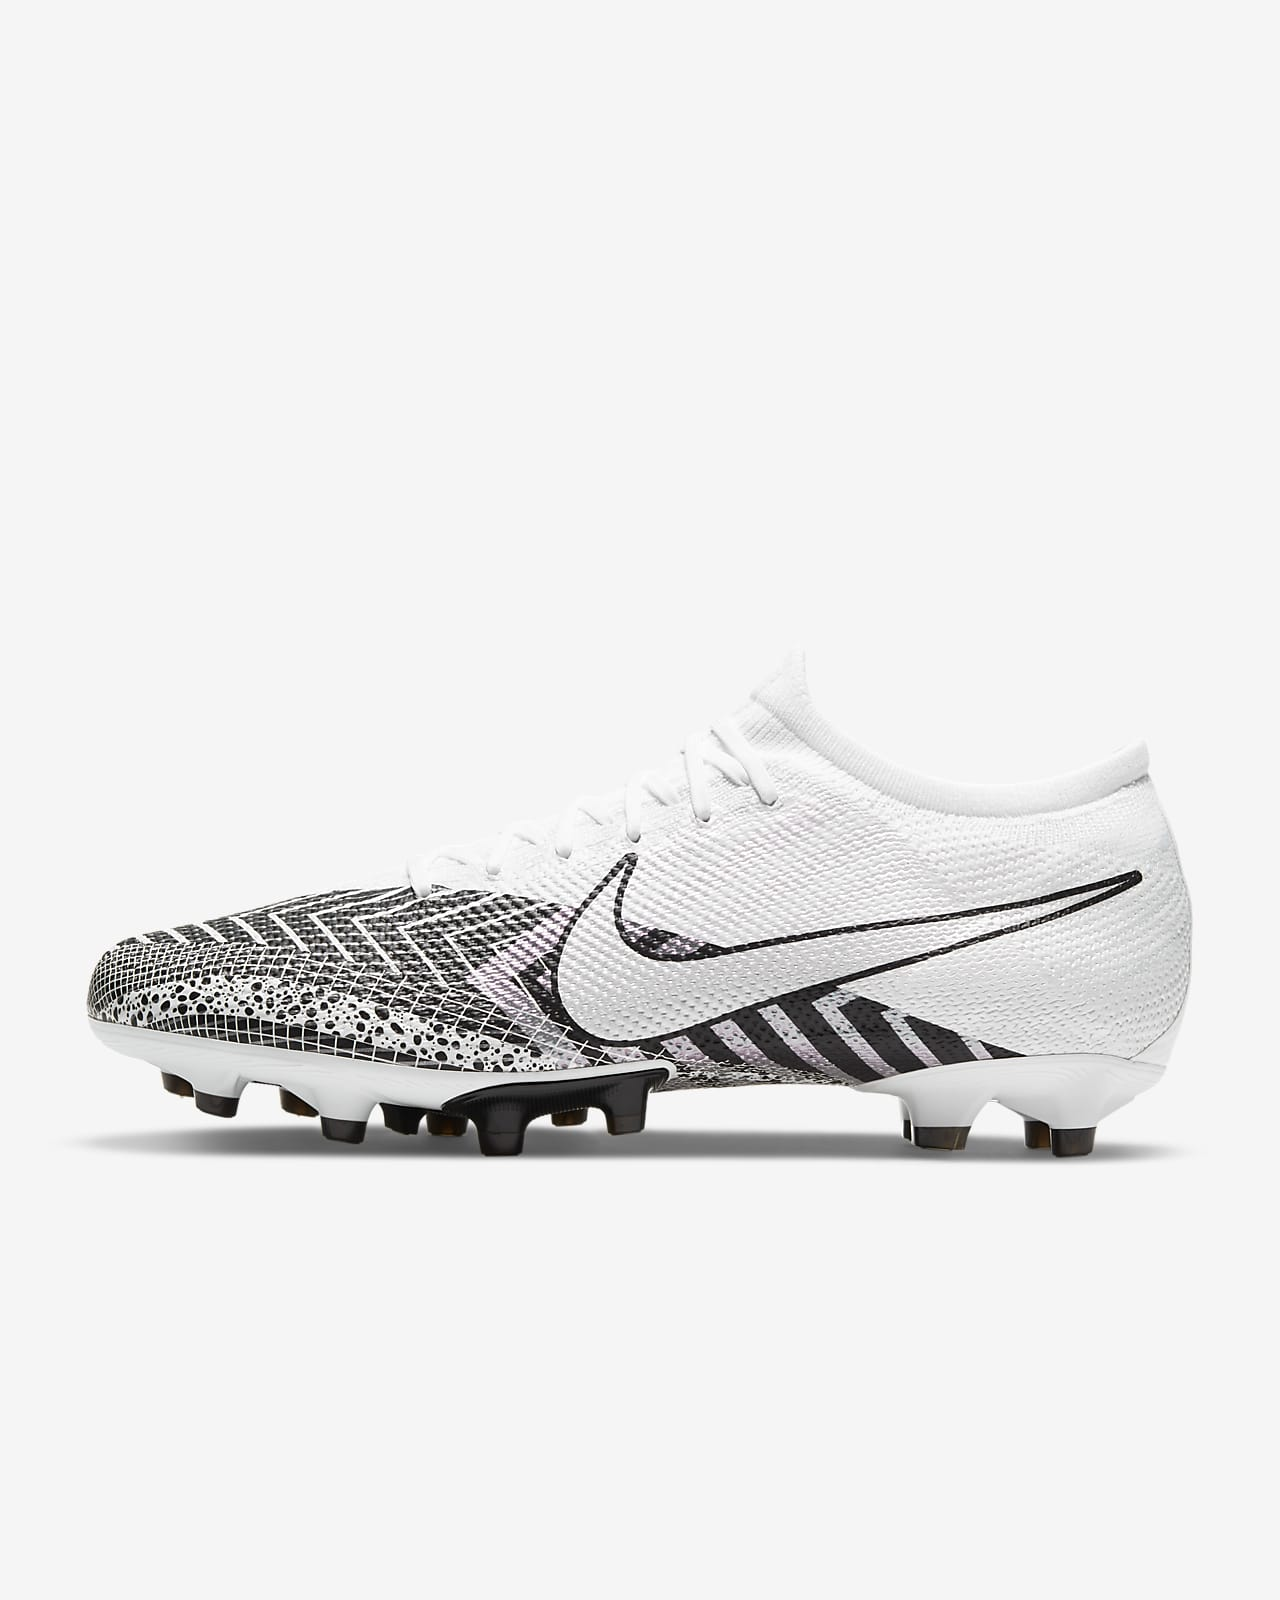 Nike Mercurial Vapor 13 Pro MDS AG-PRO Artificial-Grass Football Boot